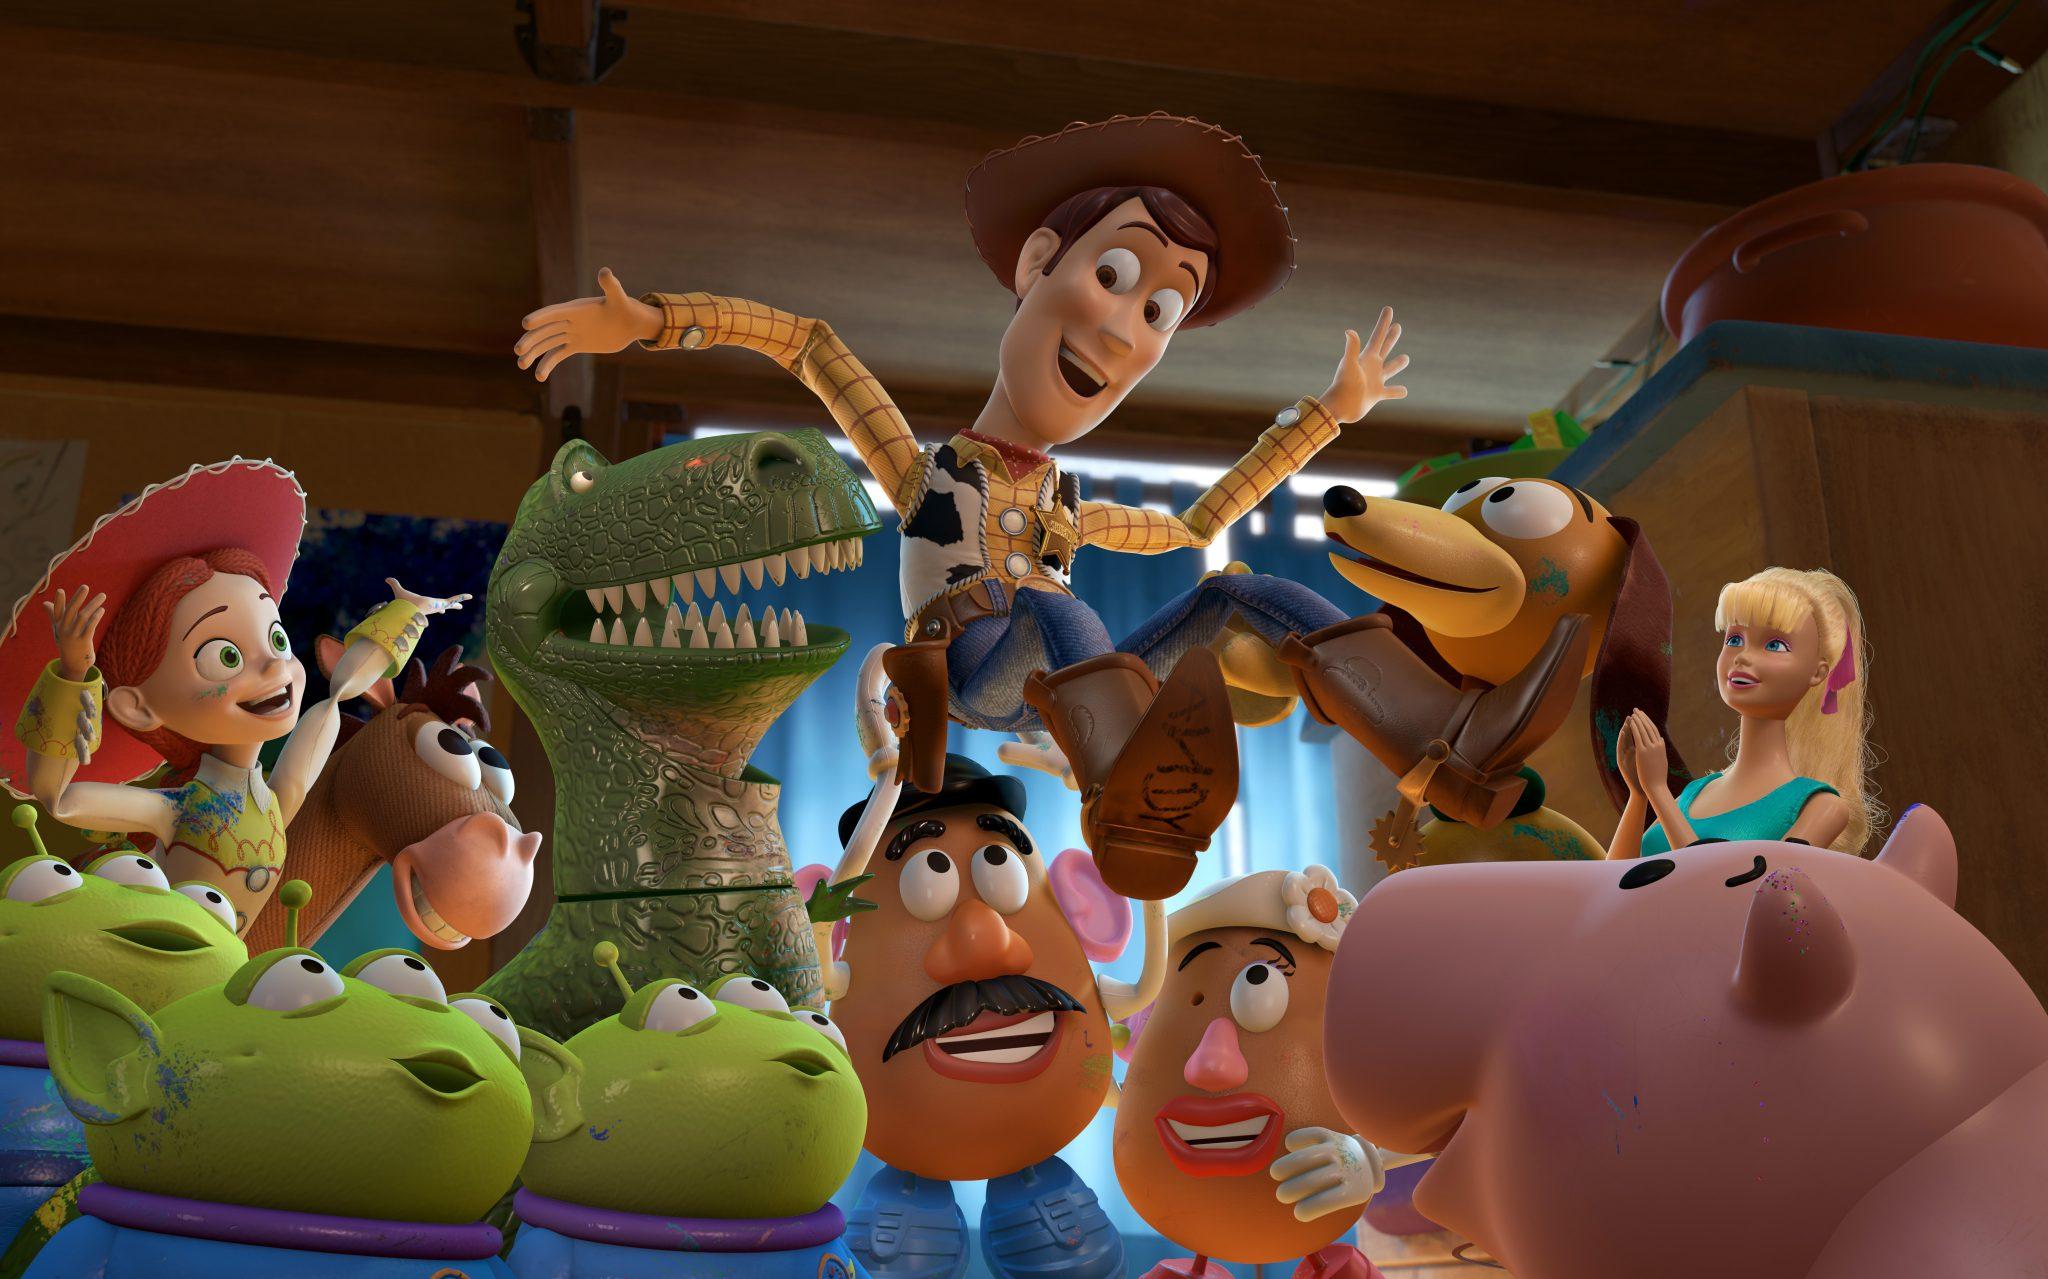 Toy-Story-3-movie-image